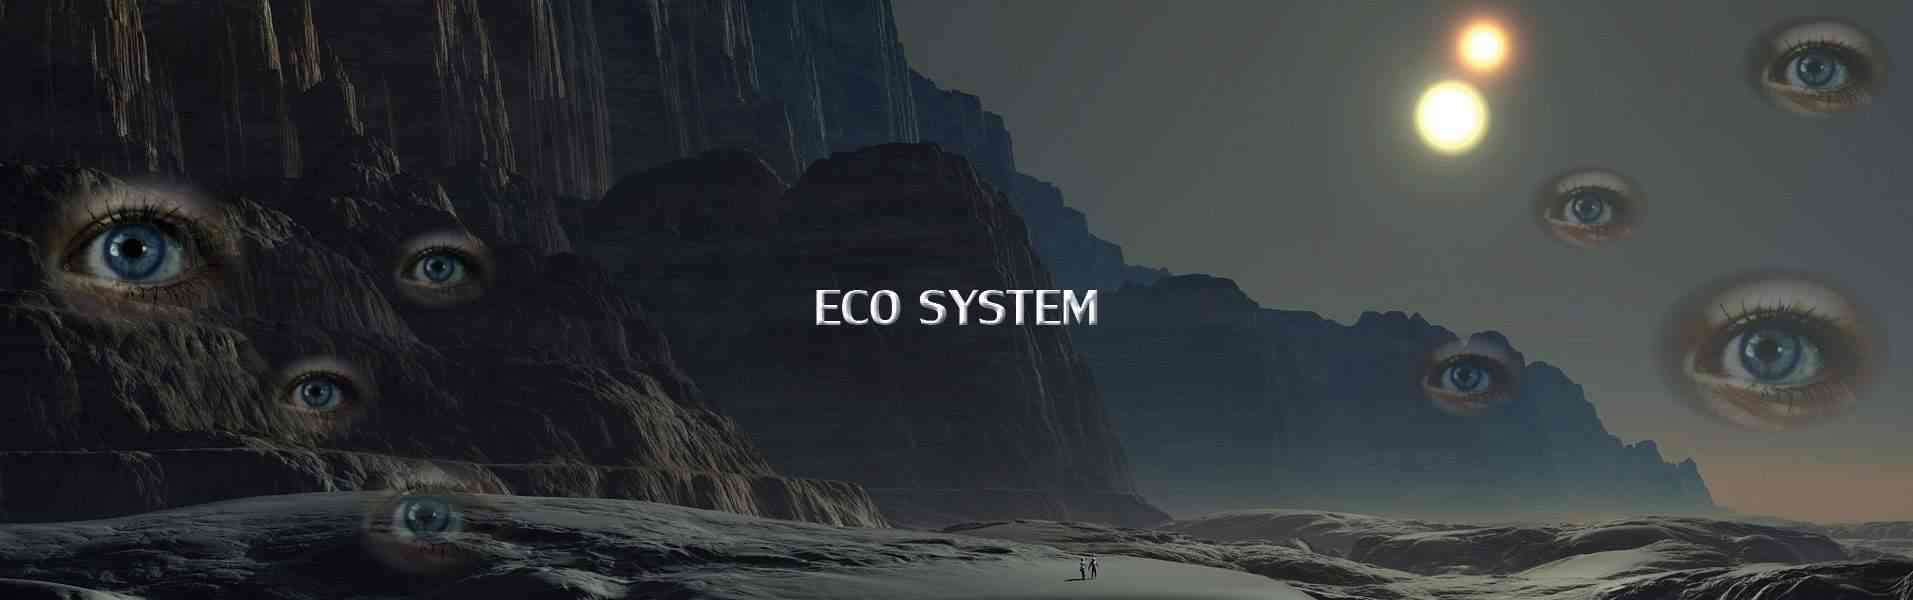 Eco system of spy novel Project Black Hungarian